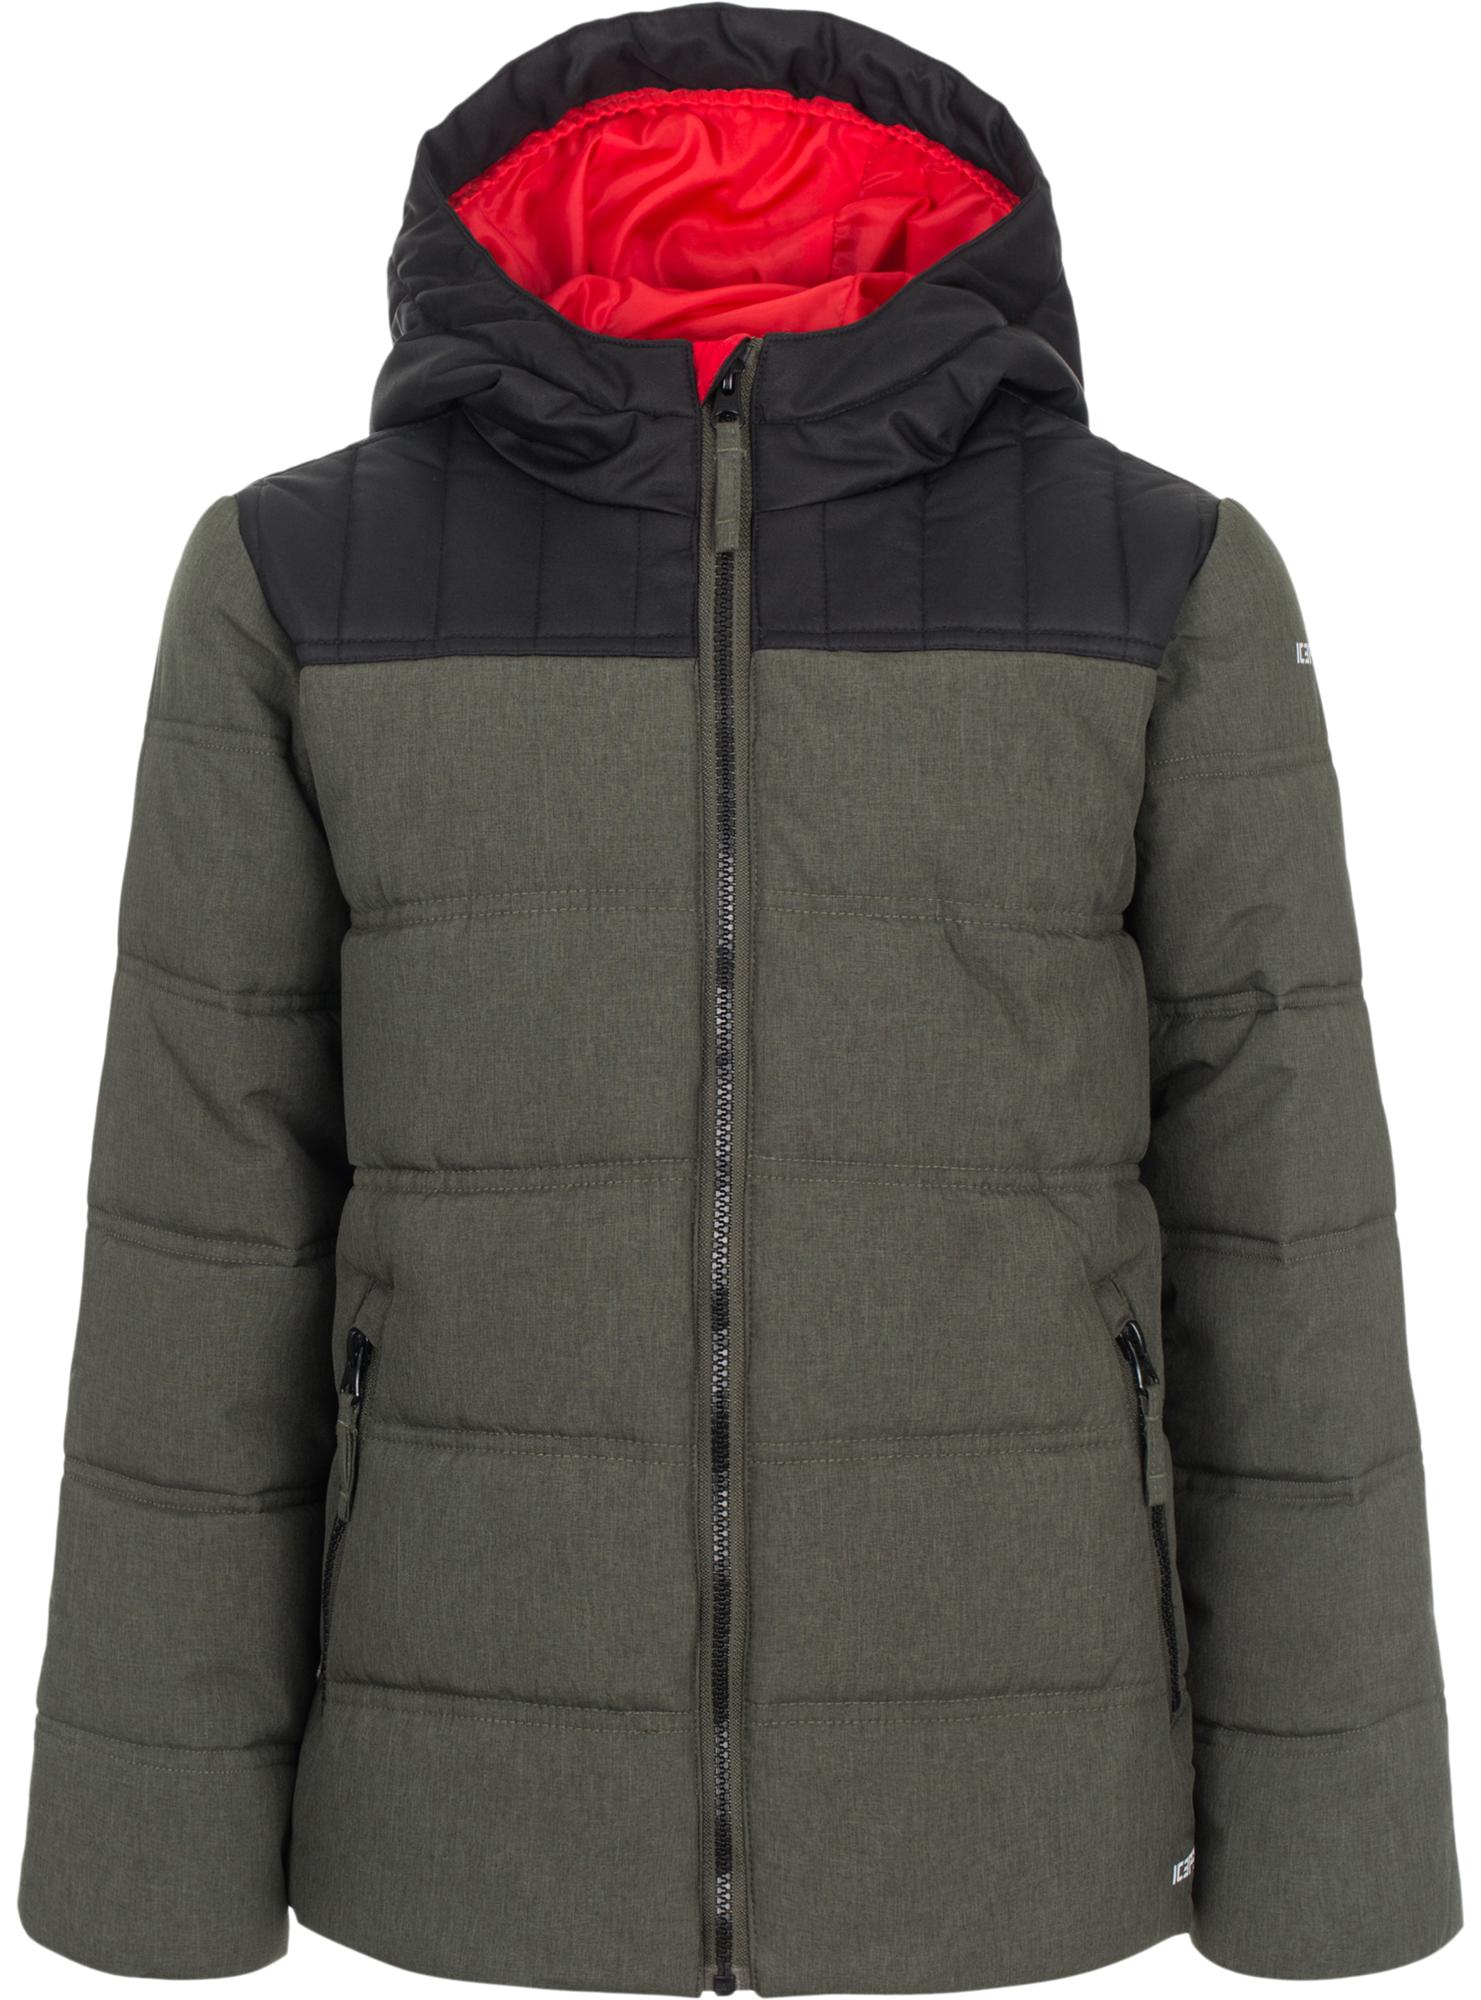 IcePeak Куртка утепленная для мальчиков IcePeak Rimo куртка для мальчиков tz0237